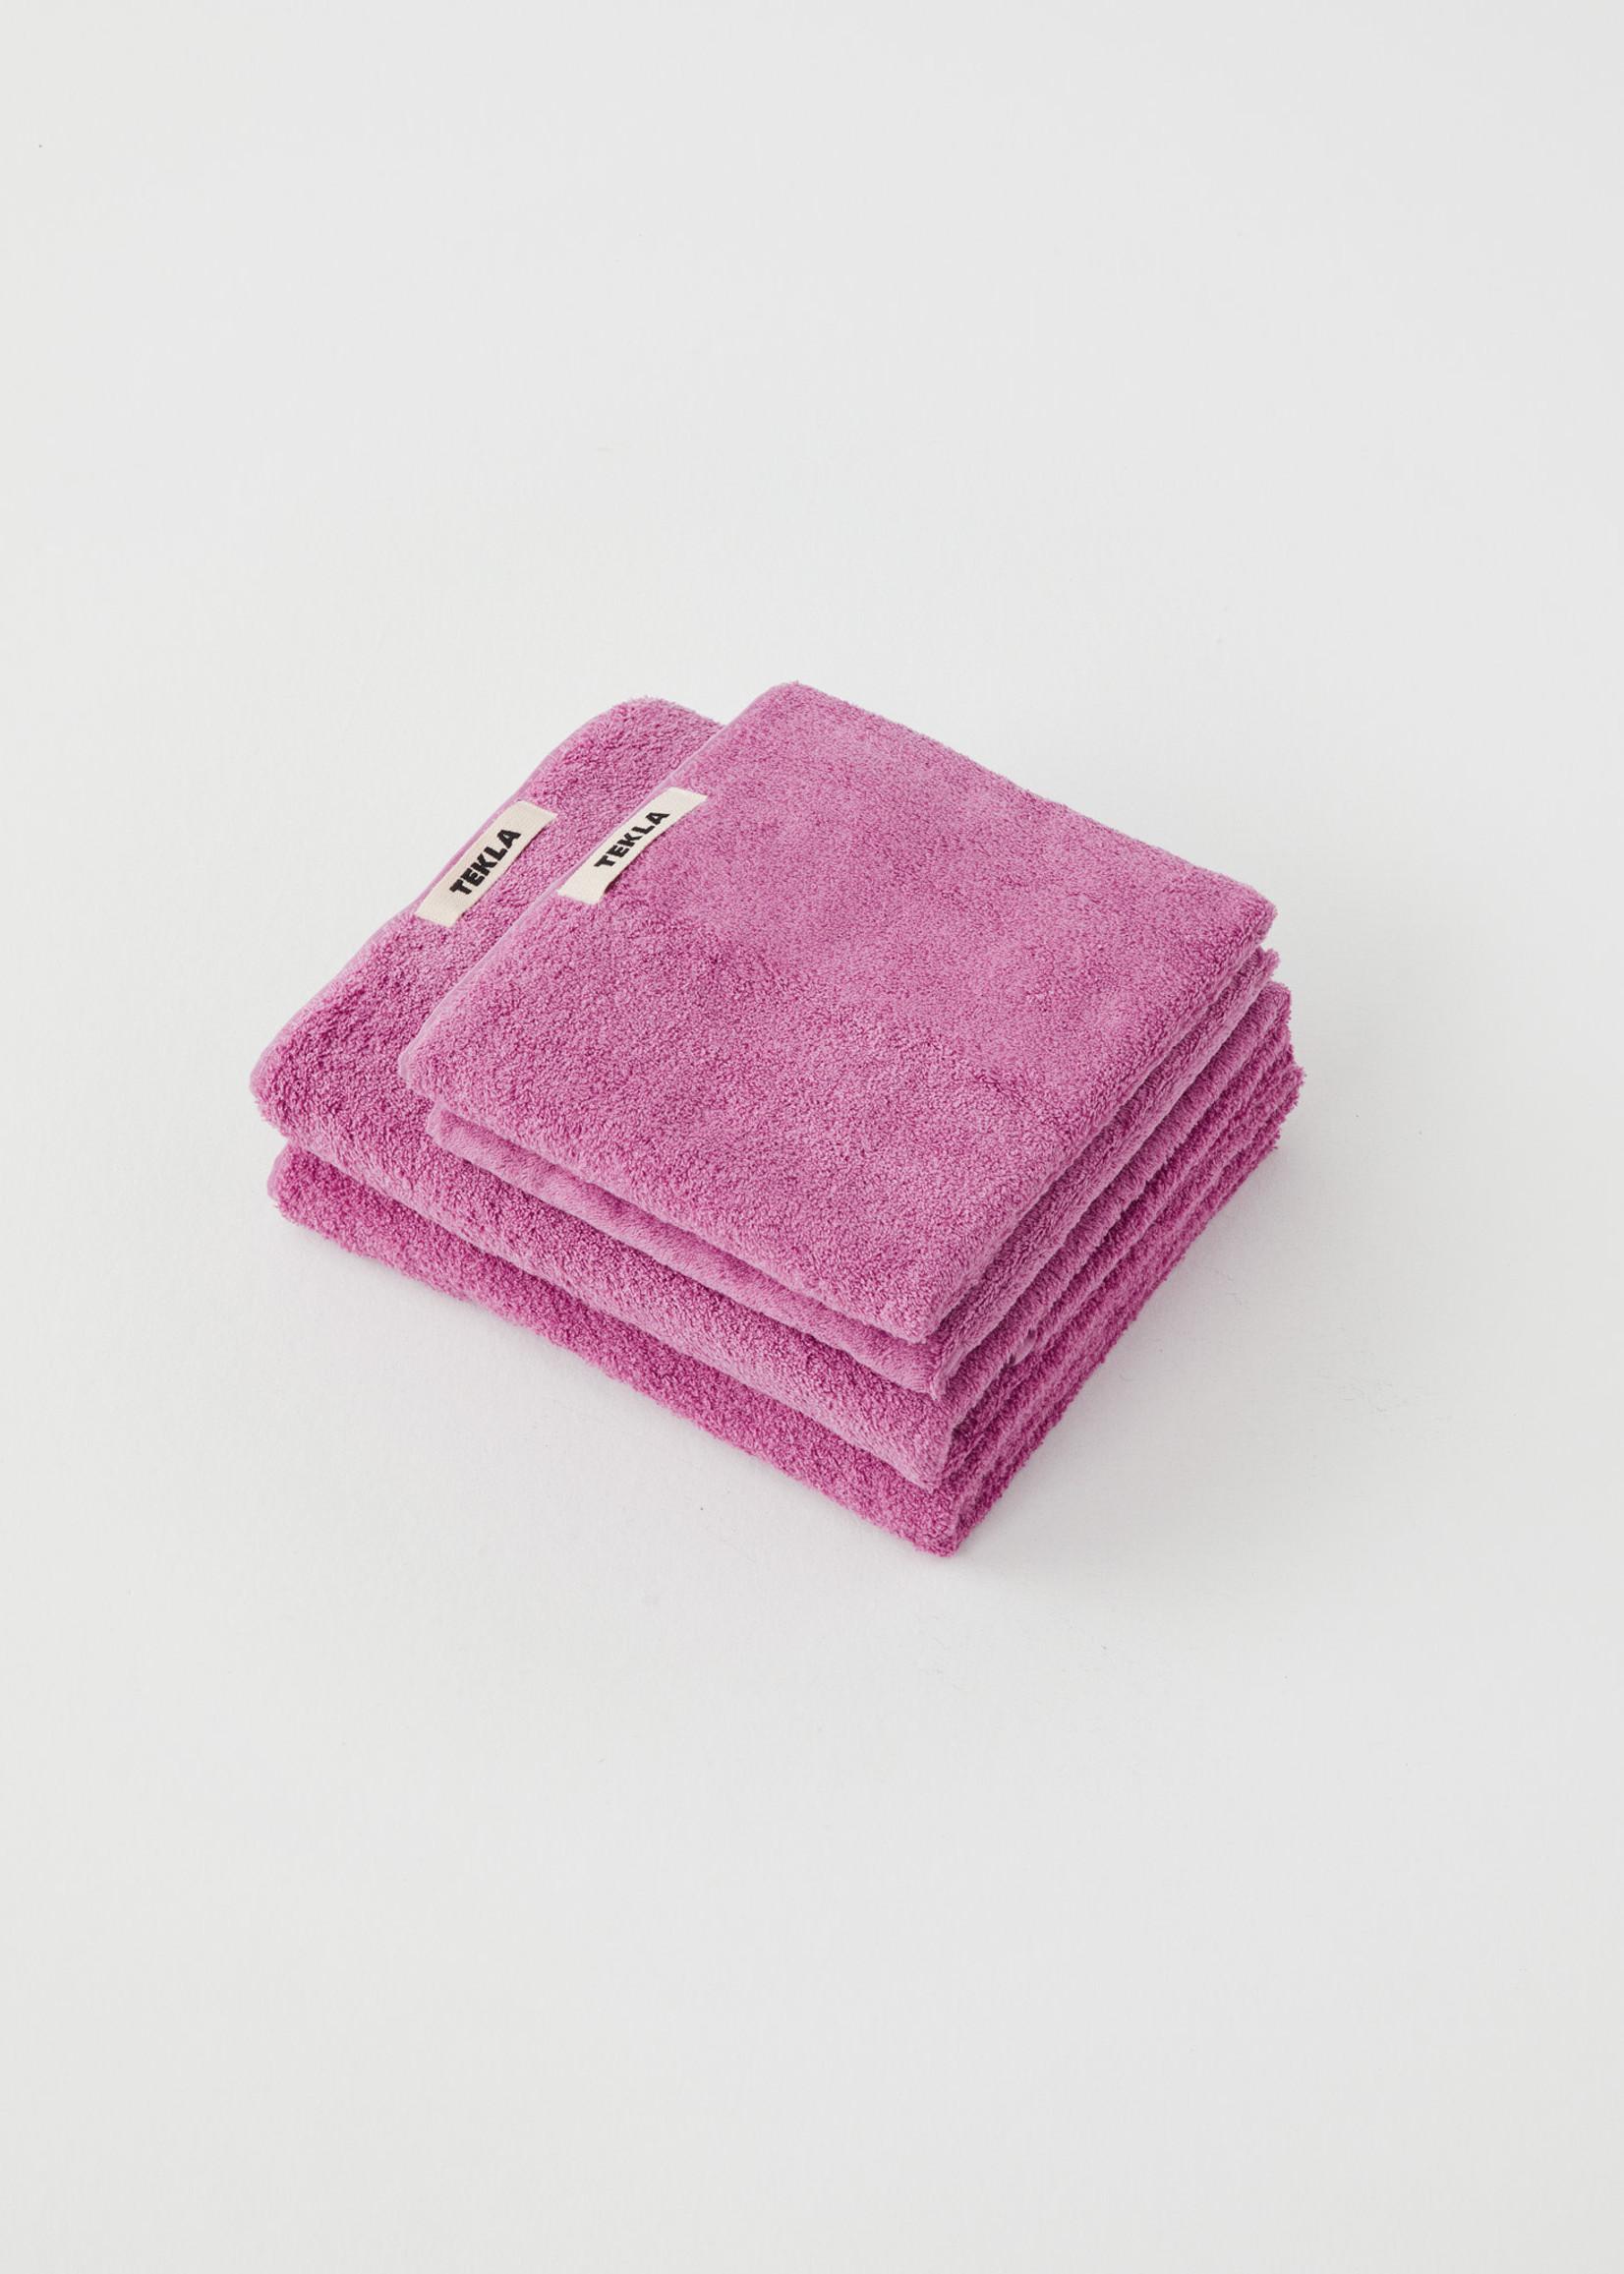 TEKLA Organic Hand Towel in Magenta